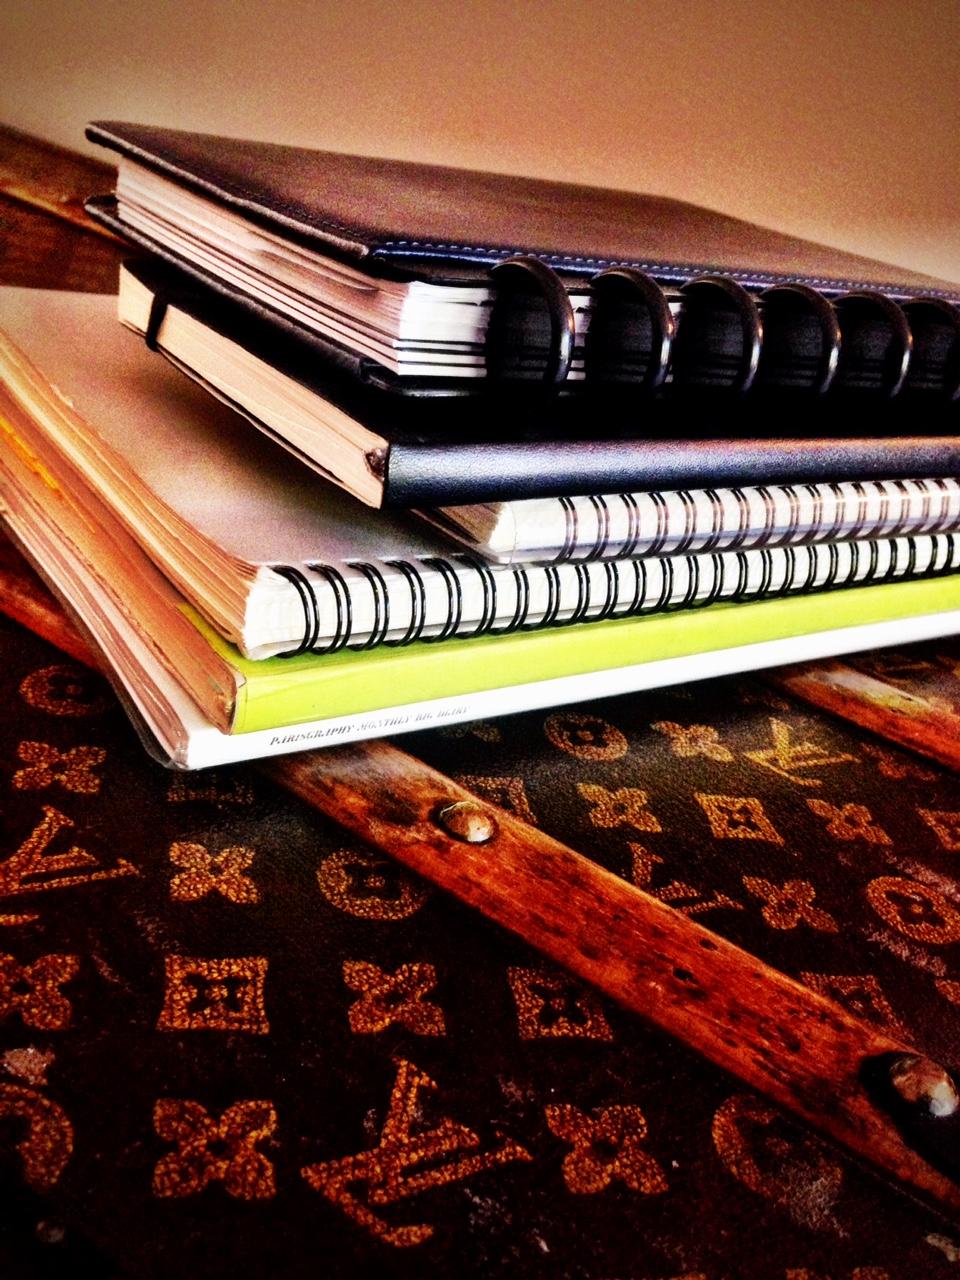 Date Planners, Organization, Bullet Journals, Planners, Calendars